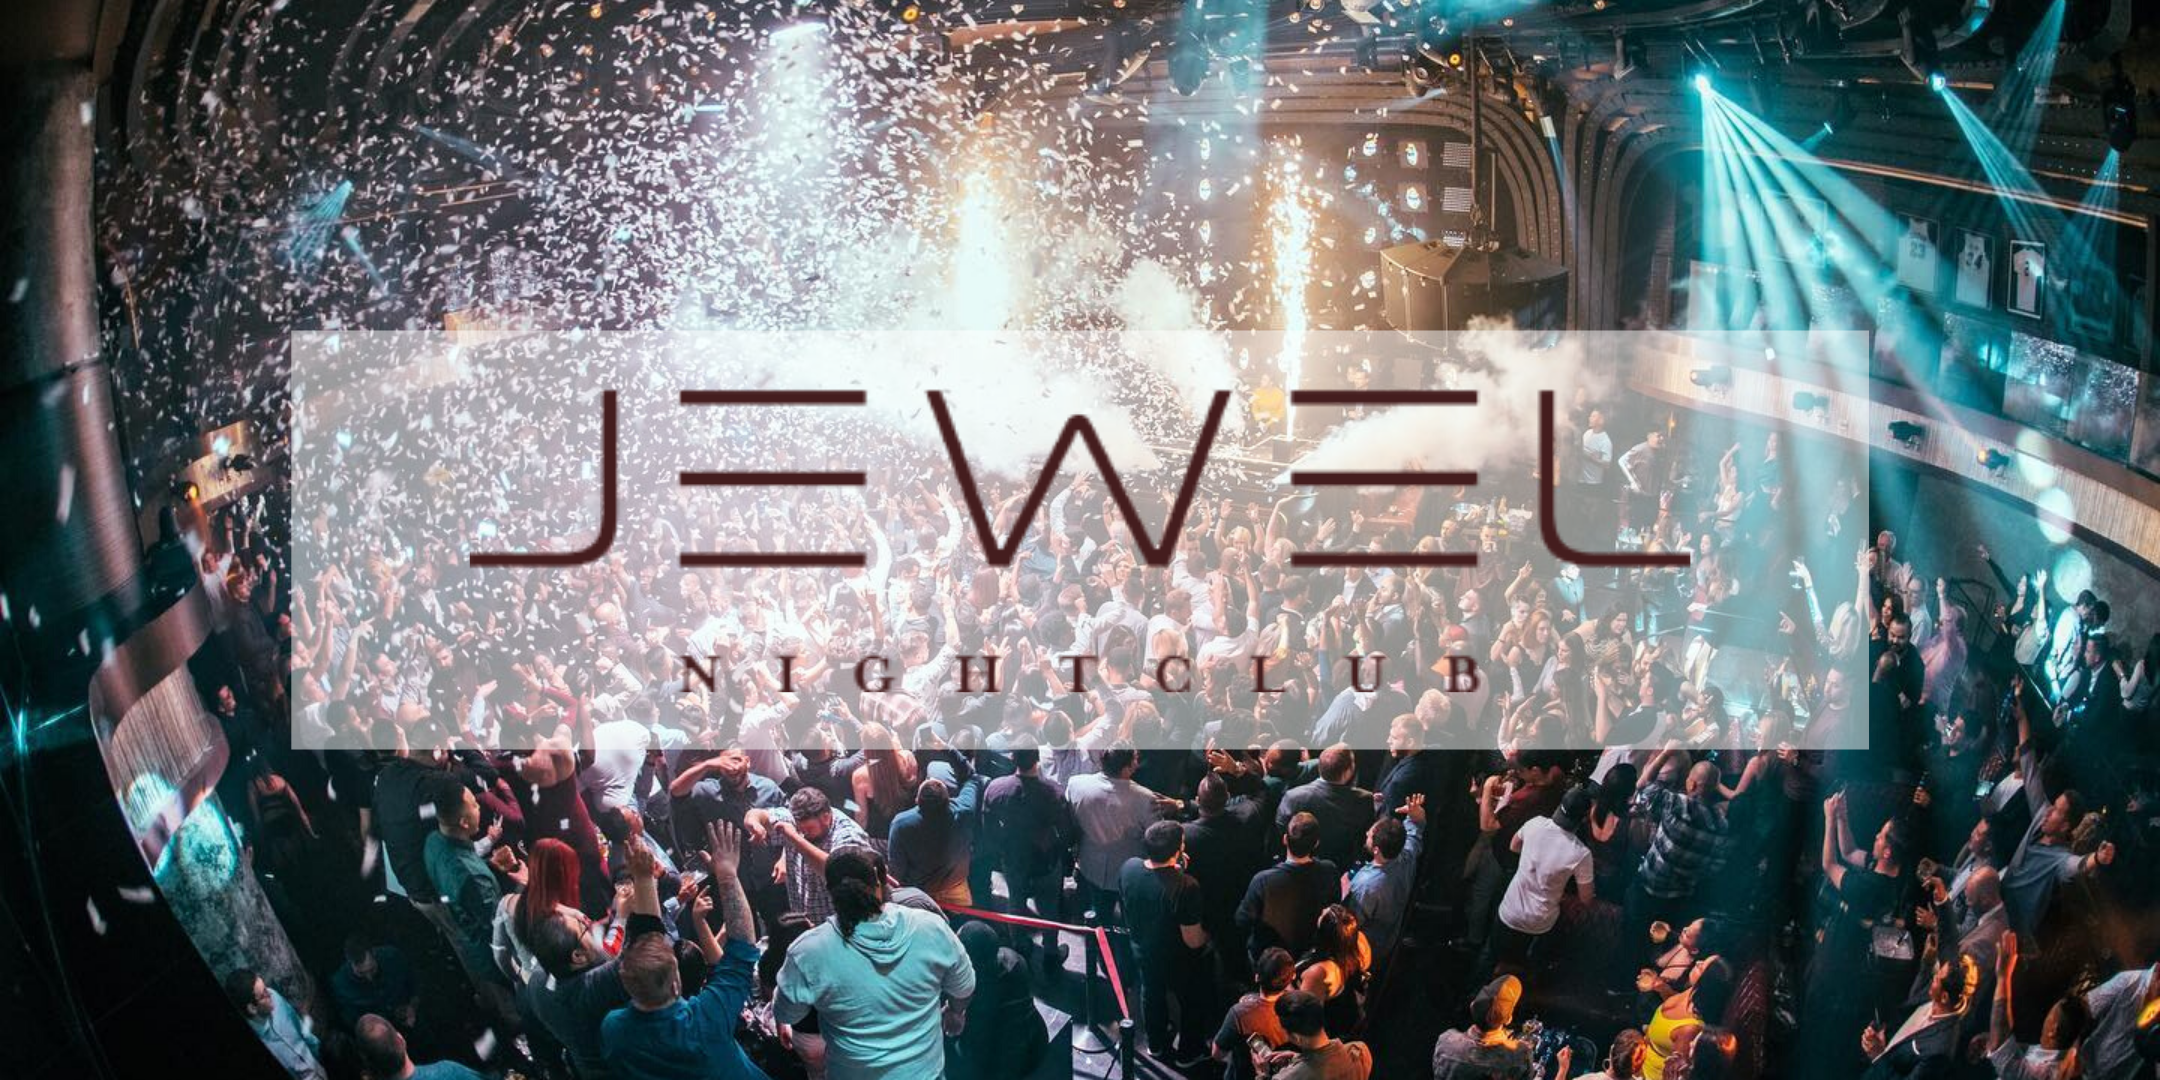 JEWEL MONDAYS! - JEWEL NIGHTCLUB AT ARIA - FREE GUEST LIST MEN AND WOMEN!